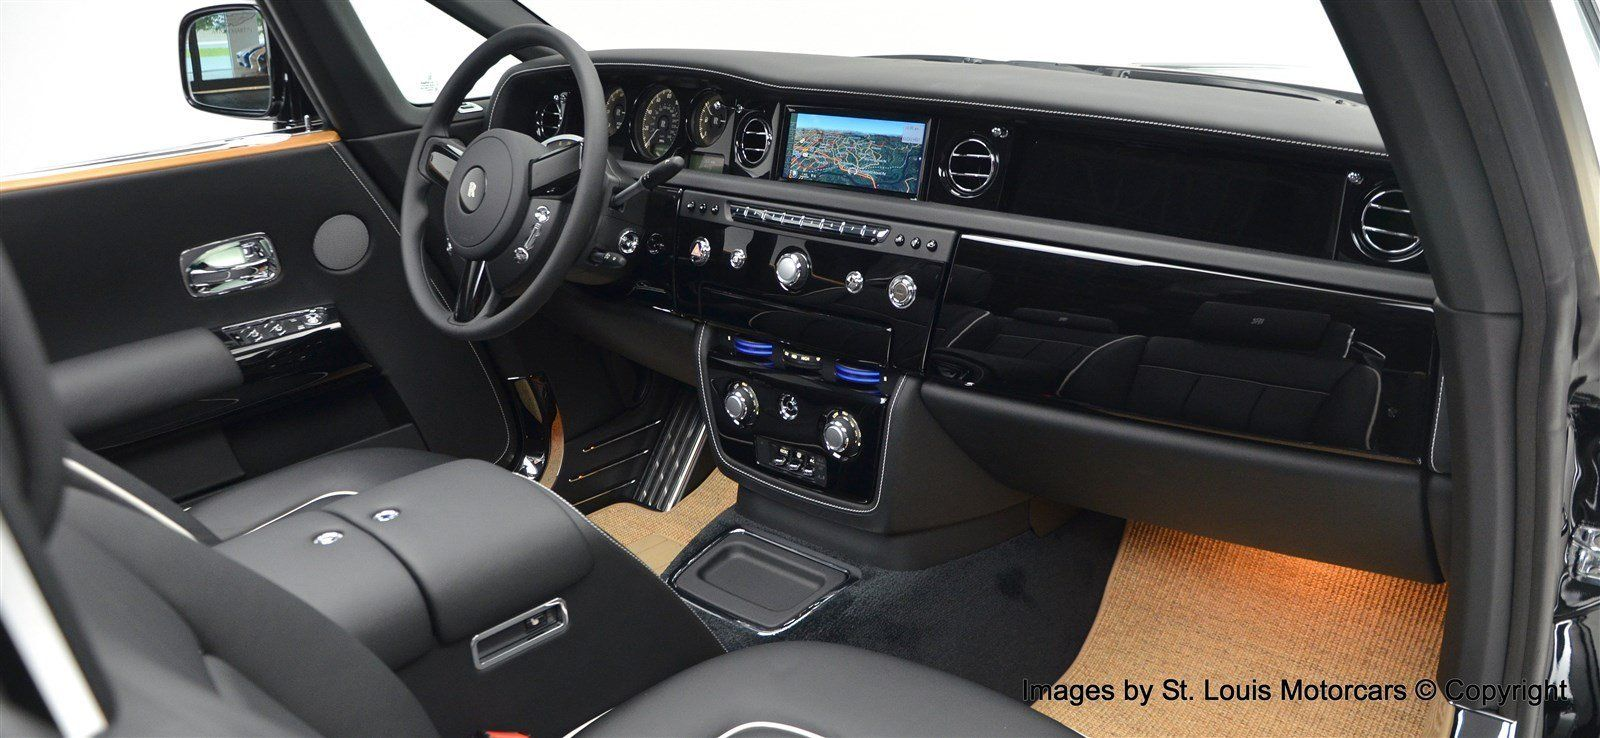 Cars for Sale: New 2017 Rolls-Royce Phantom Drophead Coupe ...